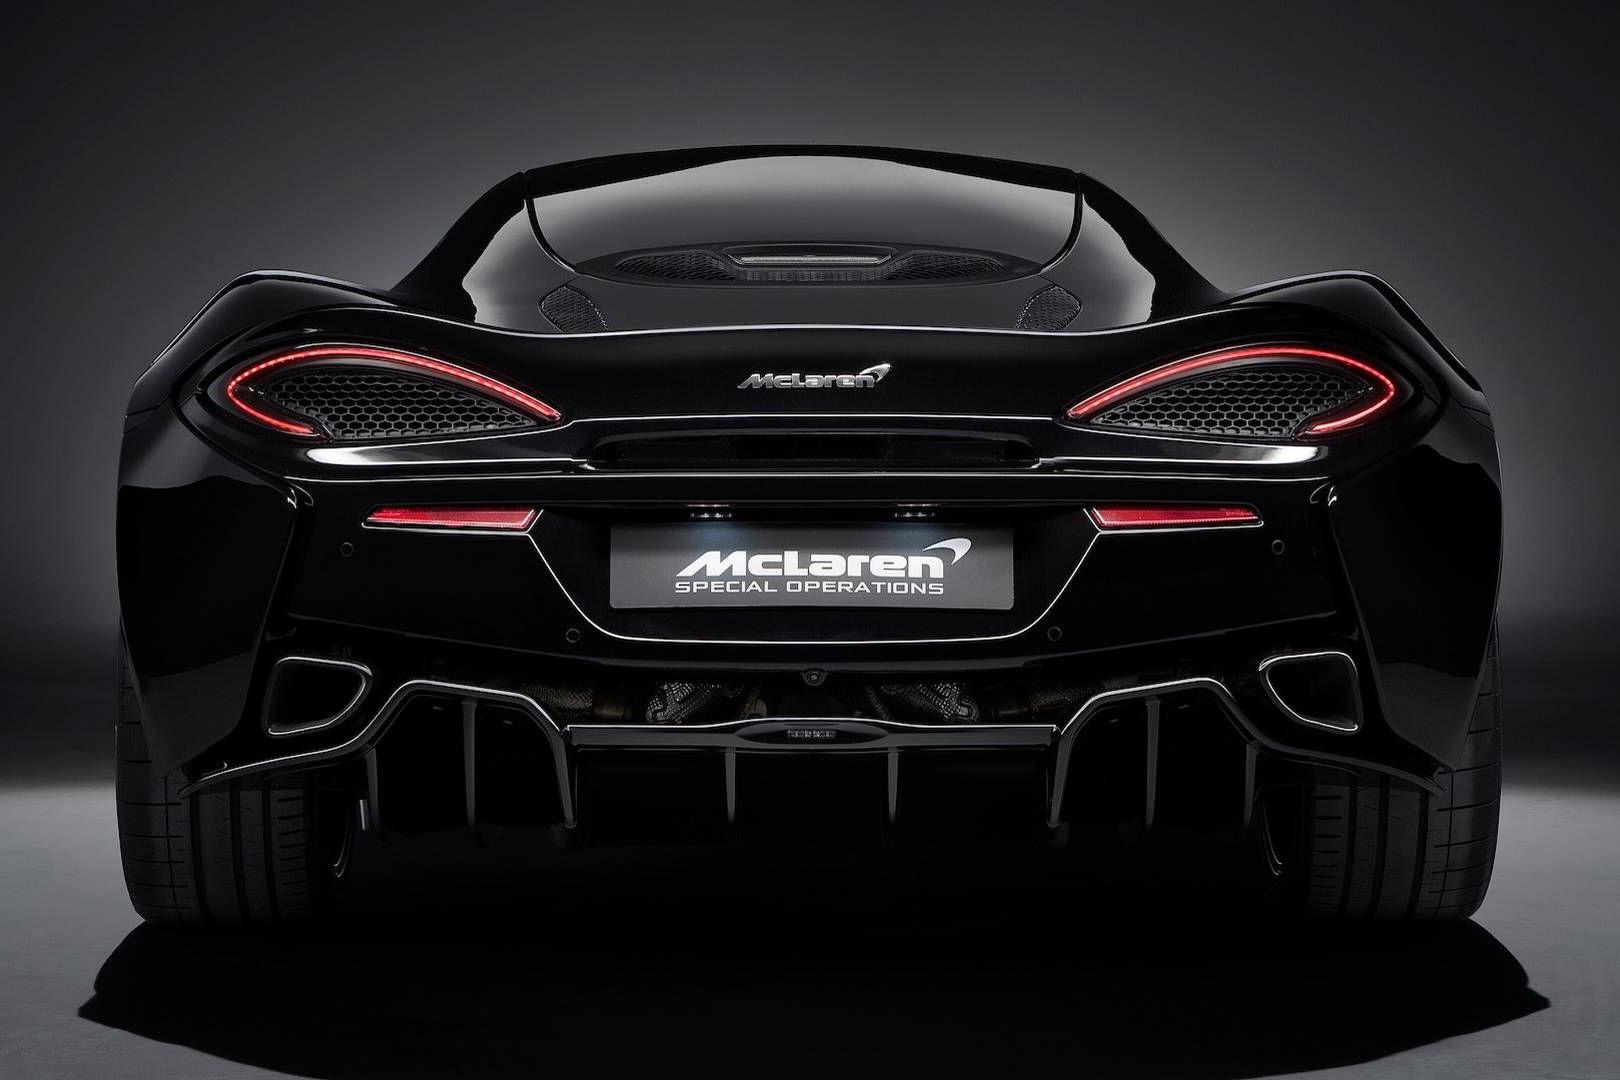 McLaren 570GT MSO Black Collection能達成傳說中的「純粹黑」嗎?